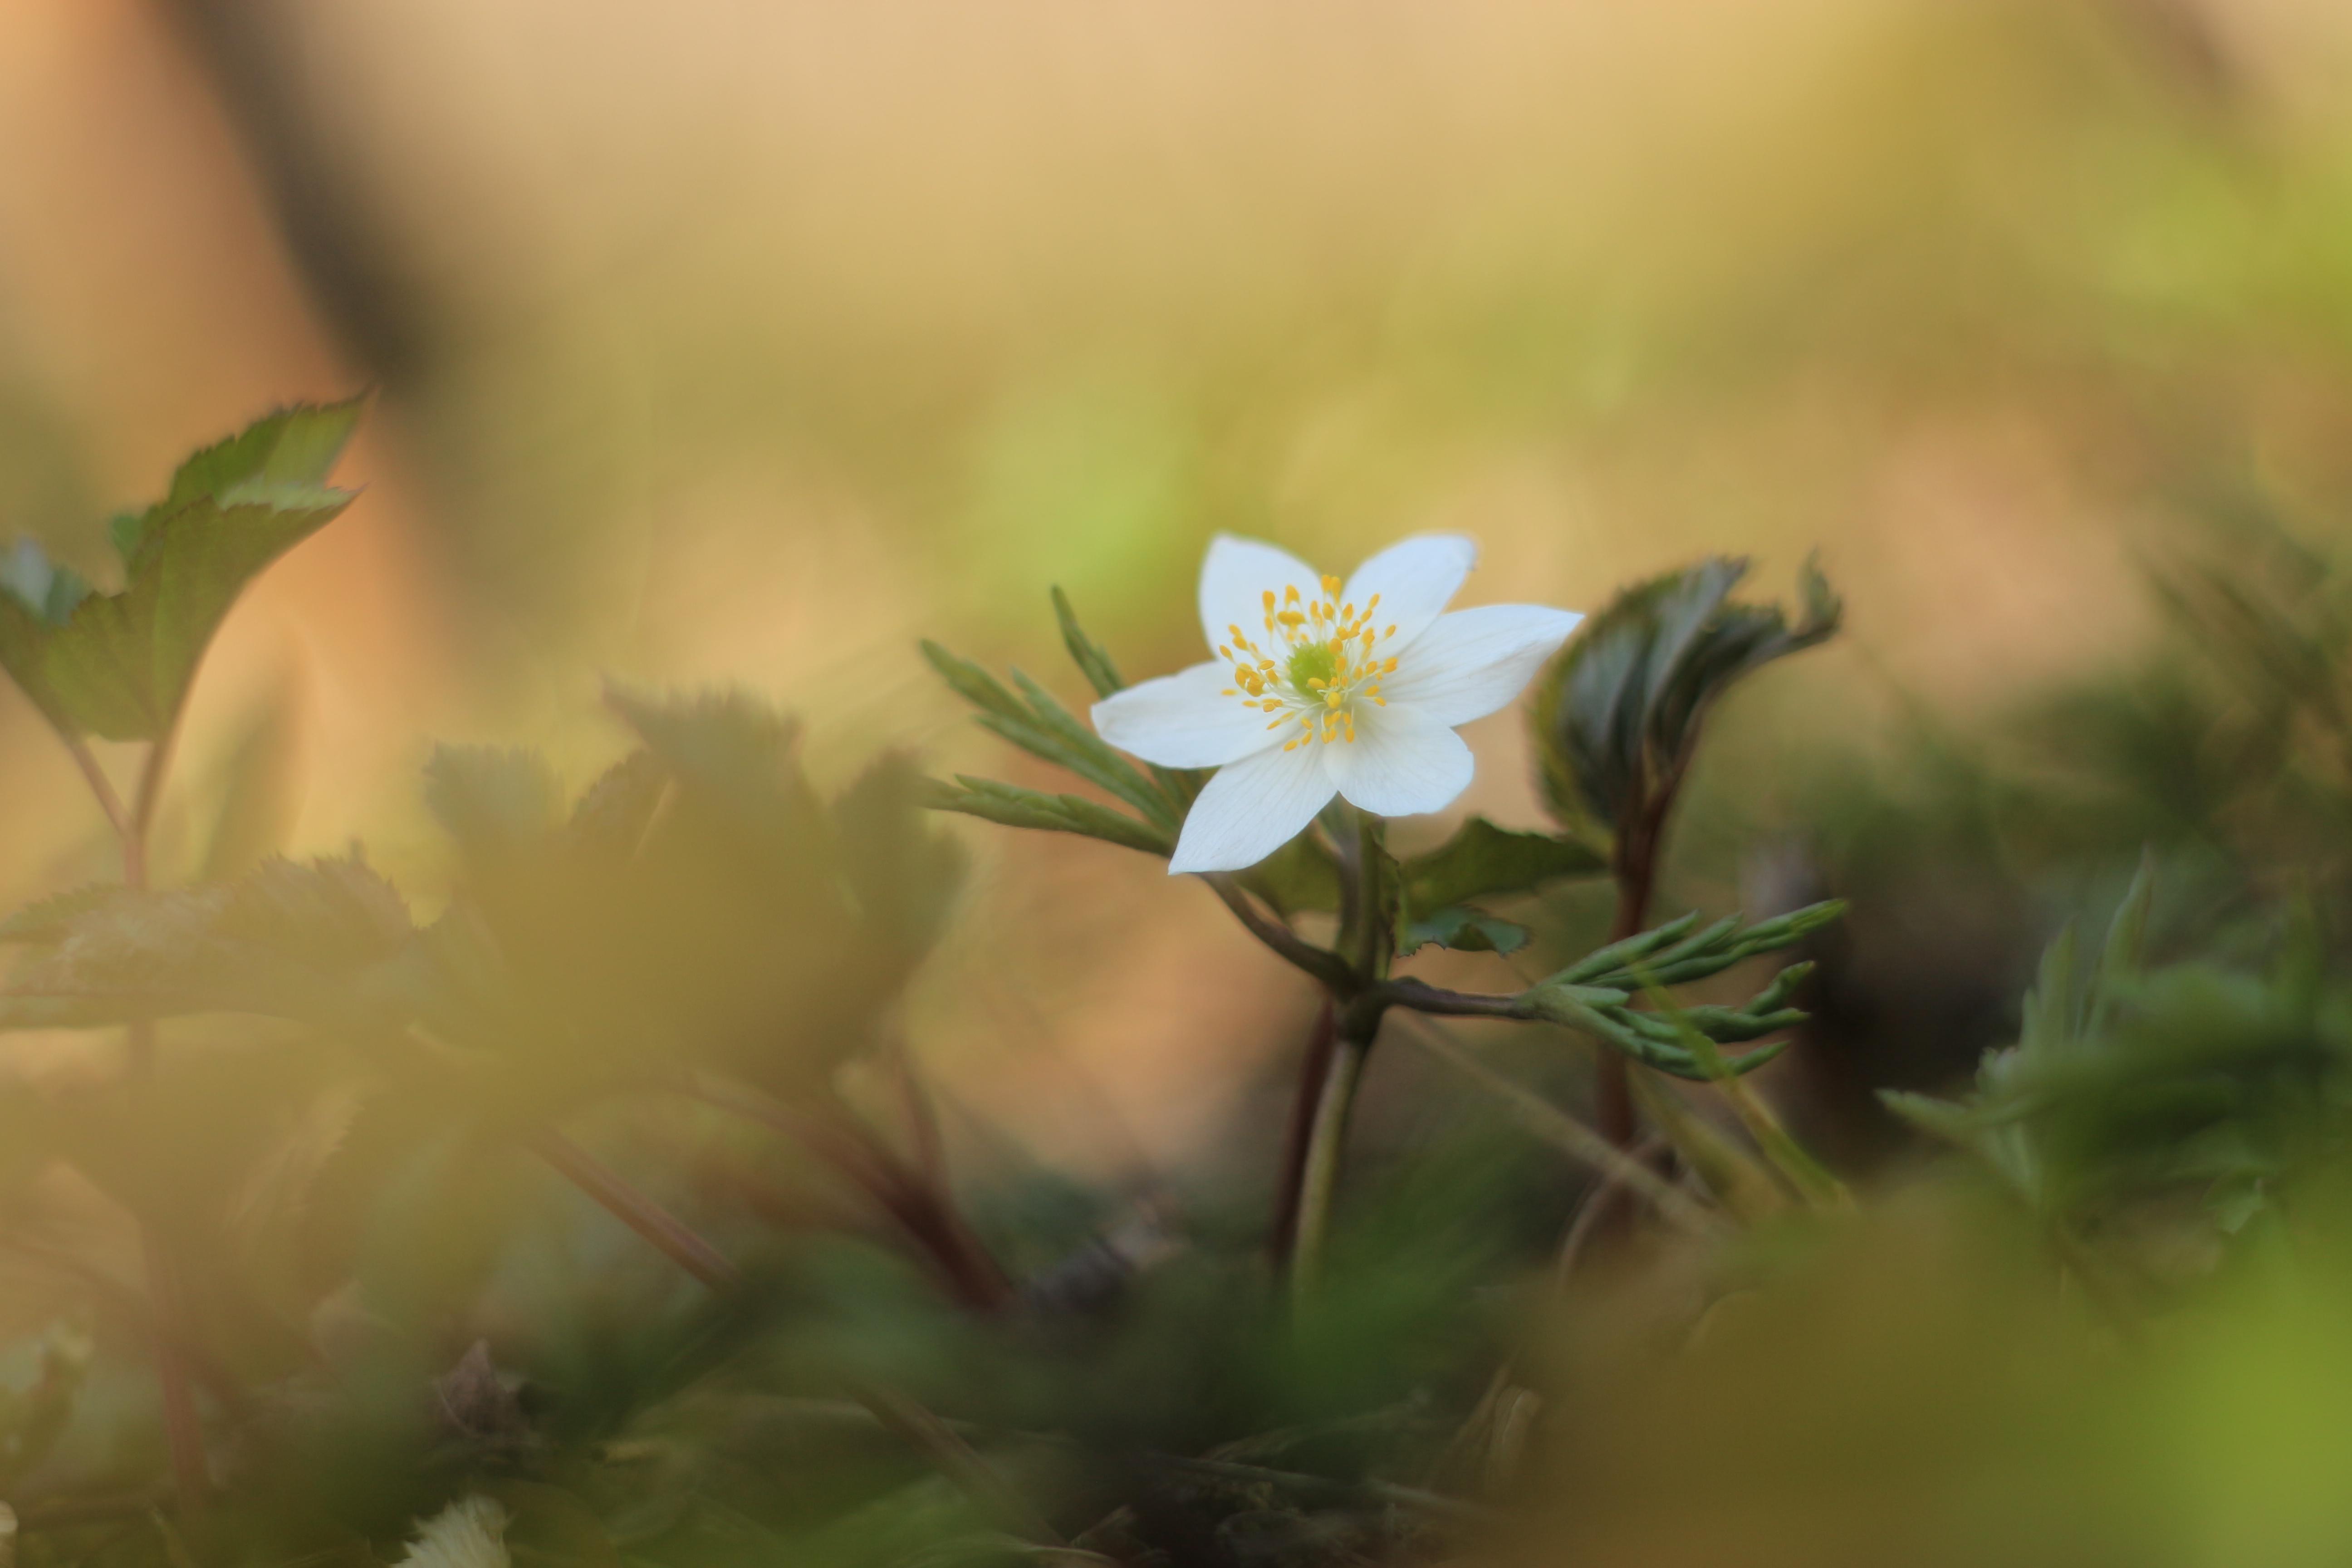 2. Platz: Anemone nemorosa, Foto: Judith Doberstein